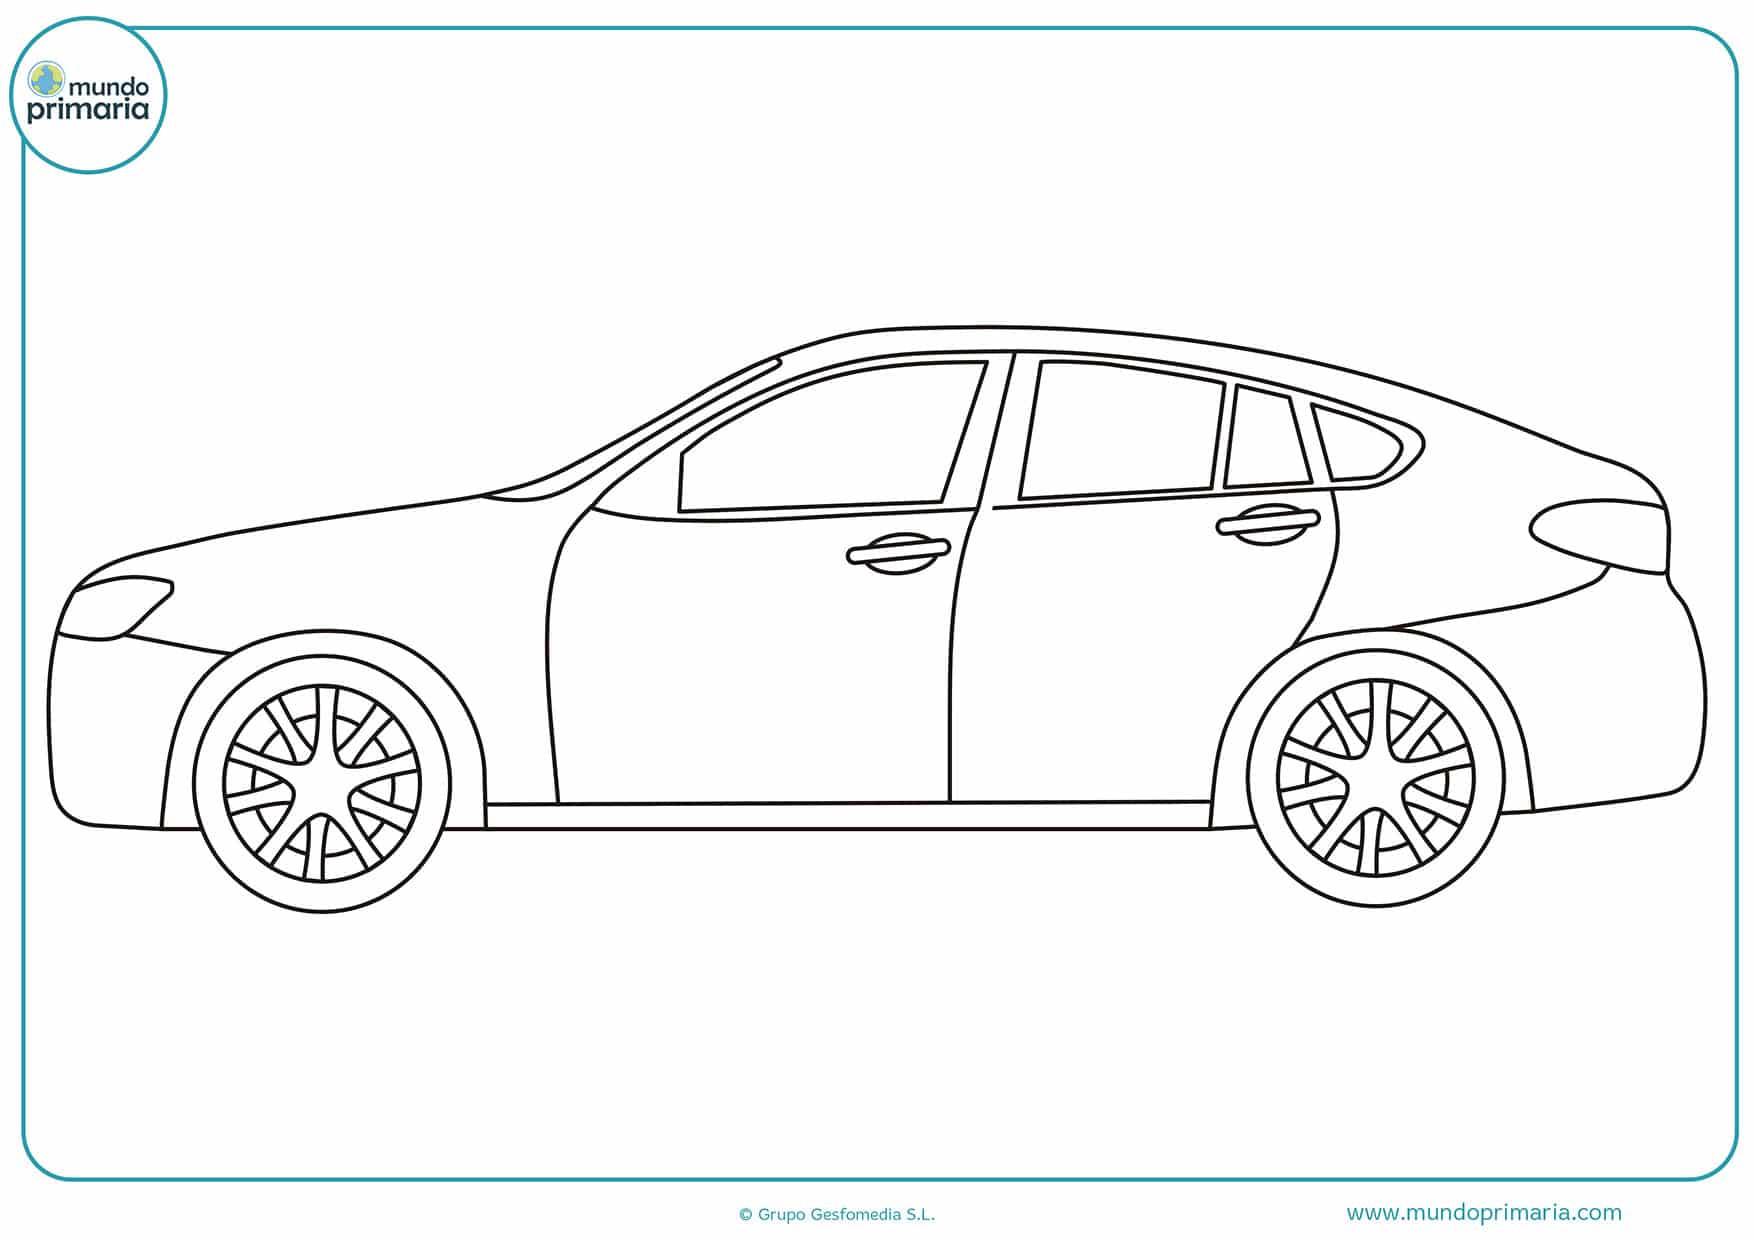 Dibujos coches fáciles colorear